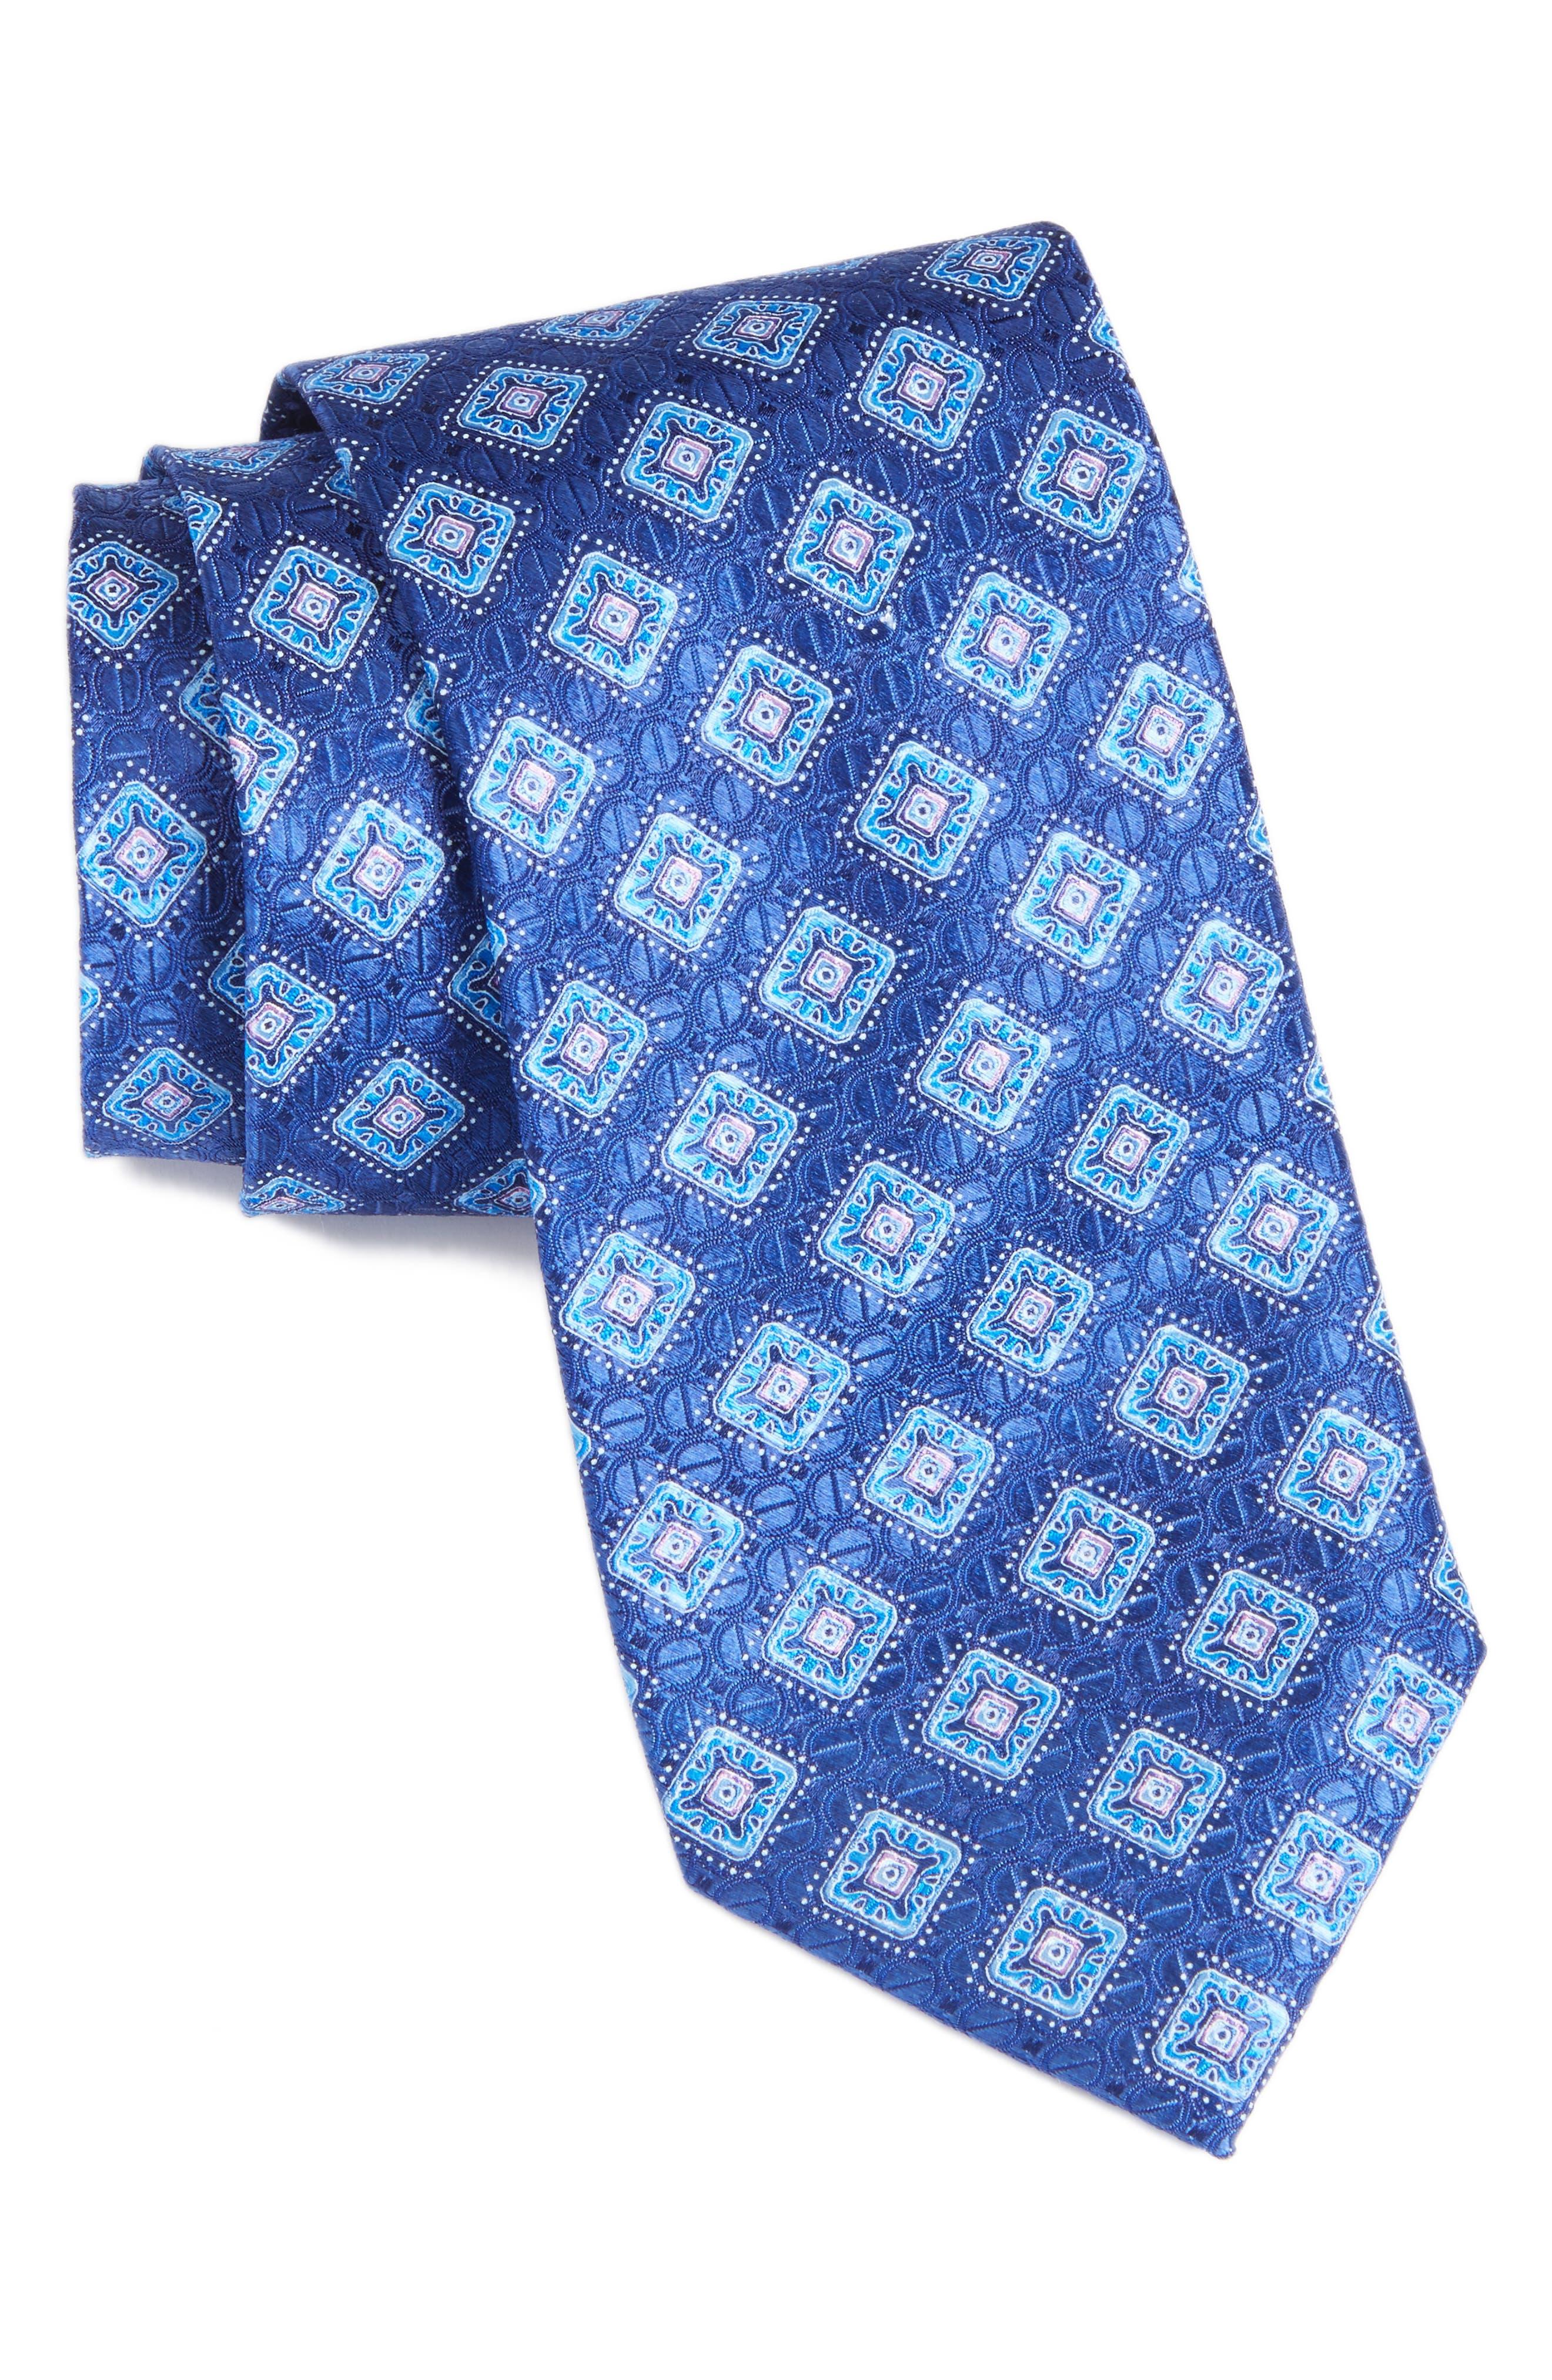 Sanders Neat Silk Tie,                             Main thumbnail 1, color,                             Navy